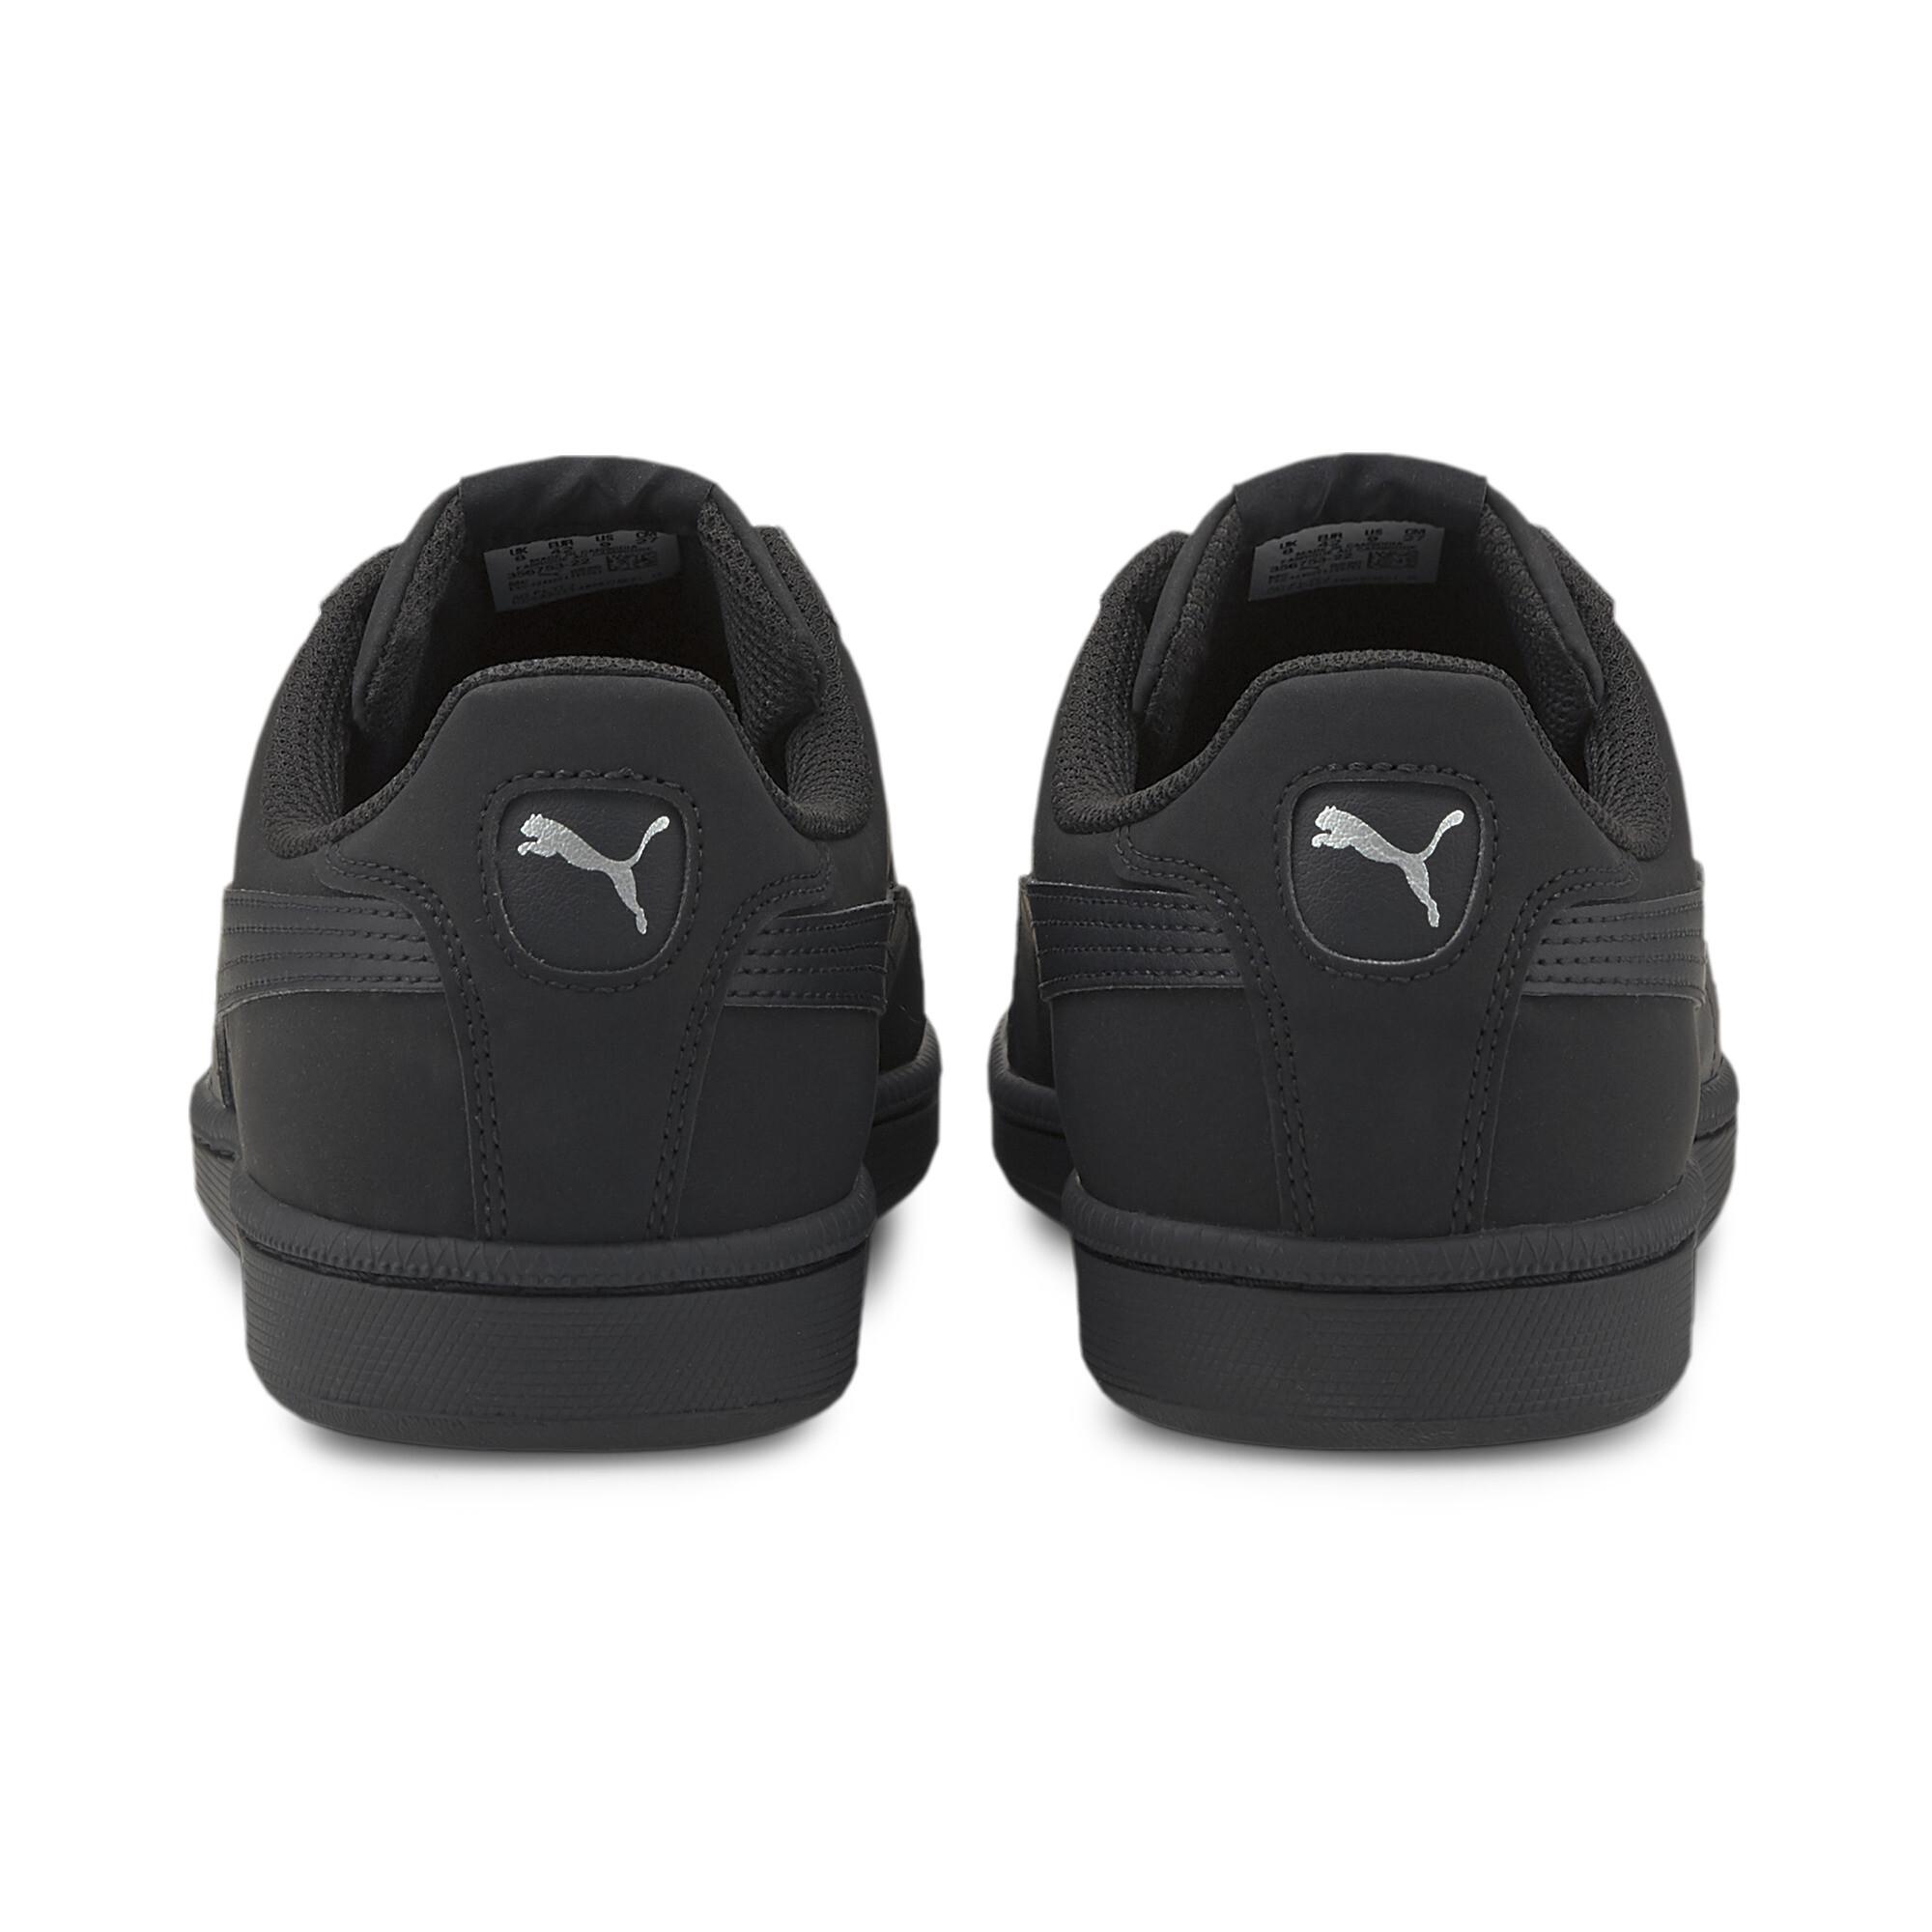 Indexbild 19 - PUMA Smash Buck Sneaker Unisex Schuhe Sport Classics Neu